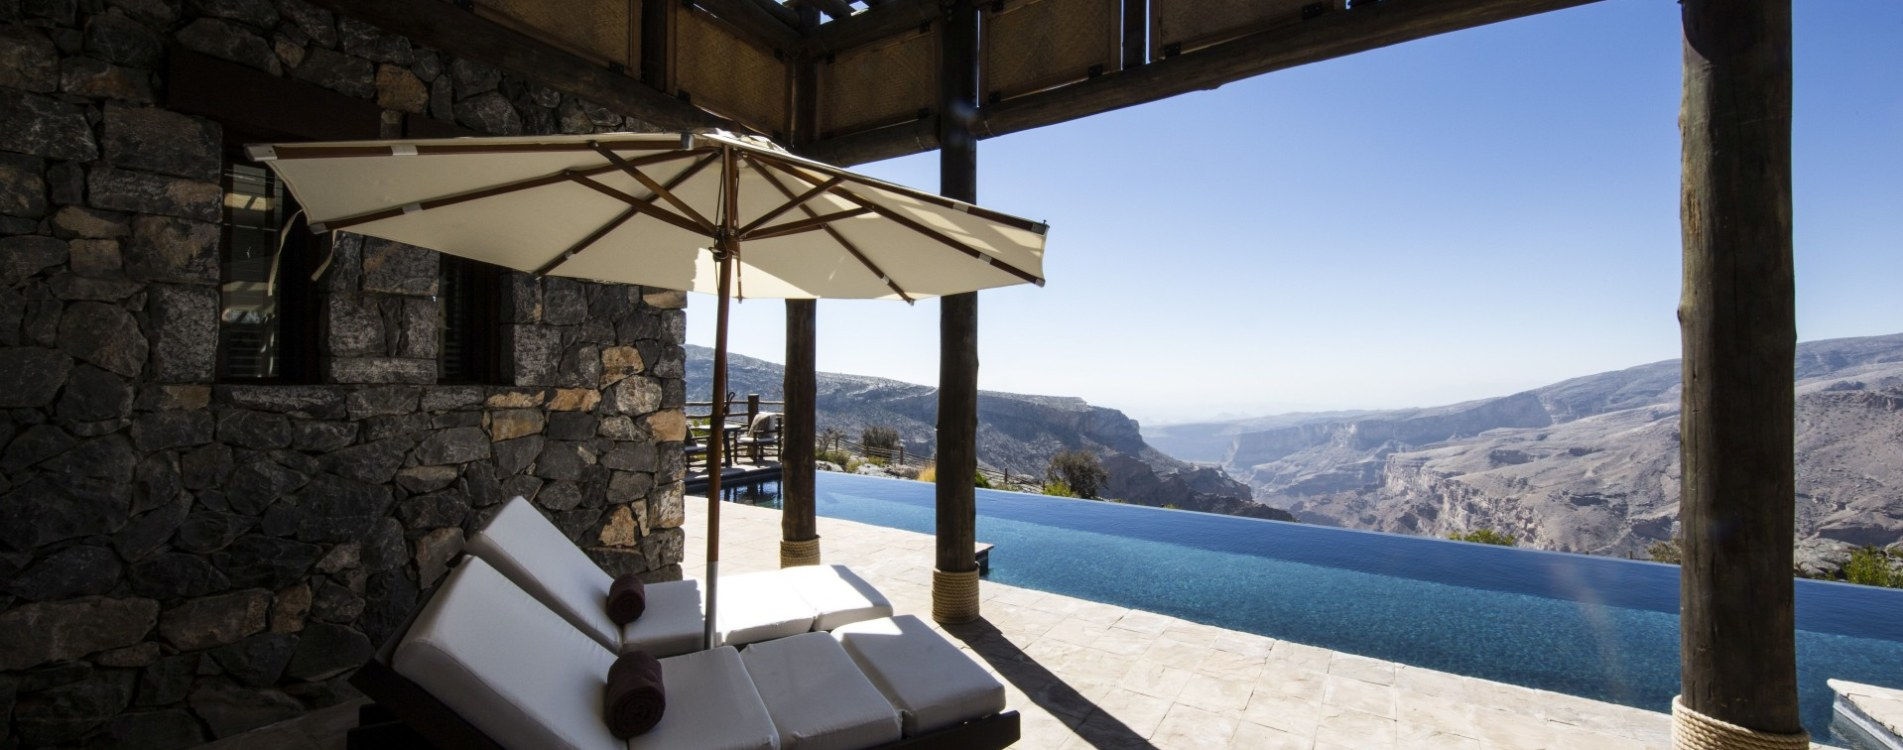 Alila-Jabal-Akhdar-Villa-Jows-Privater-Pool-Exterior-Oman.JPG